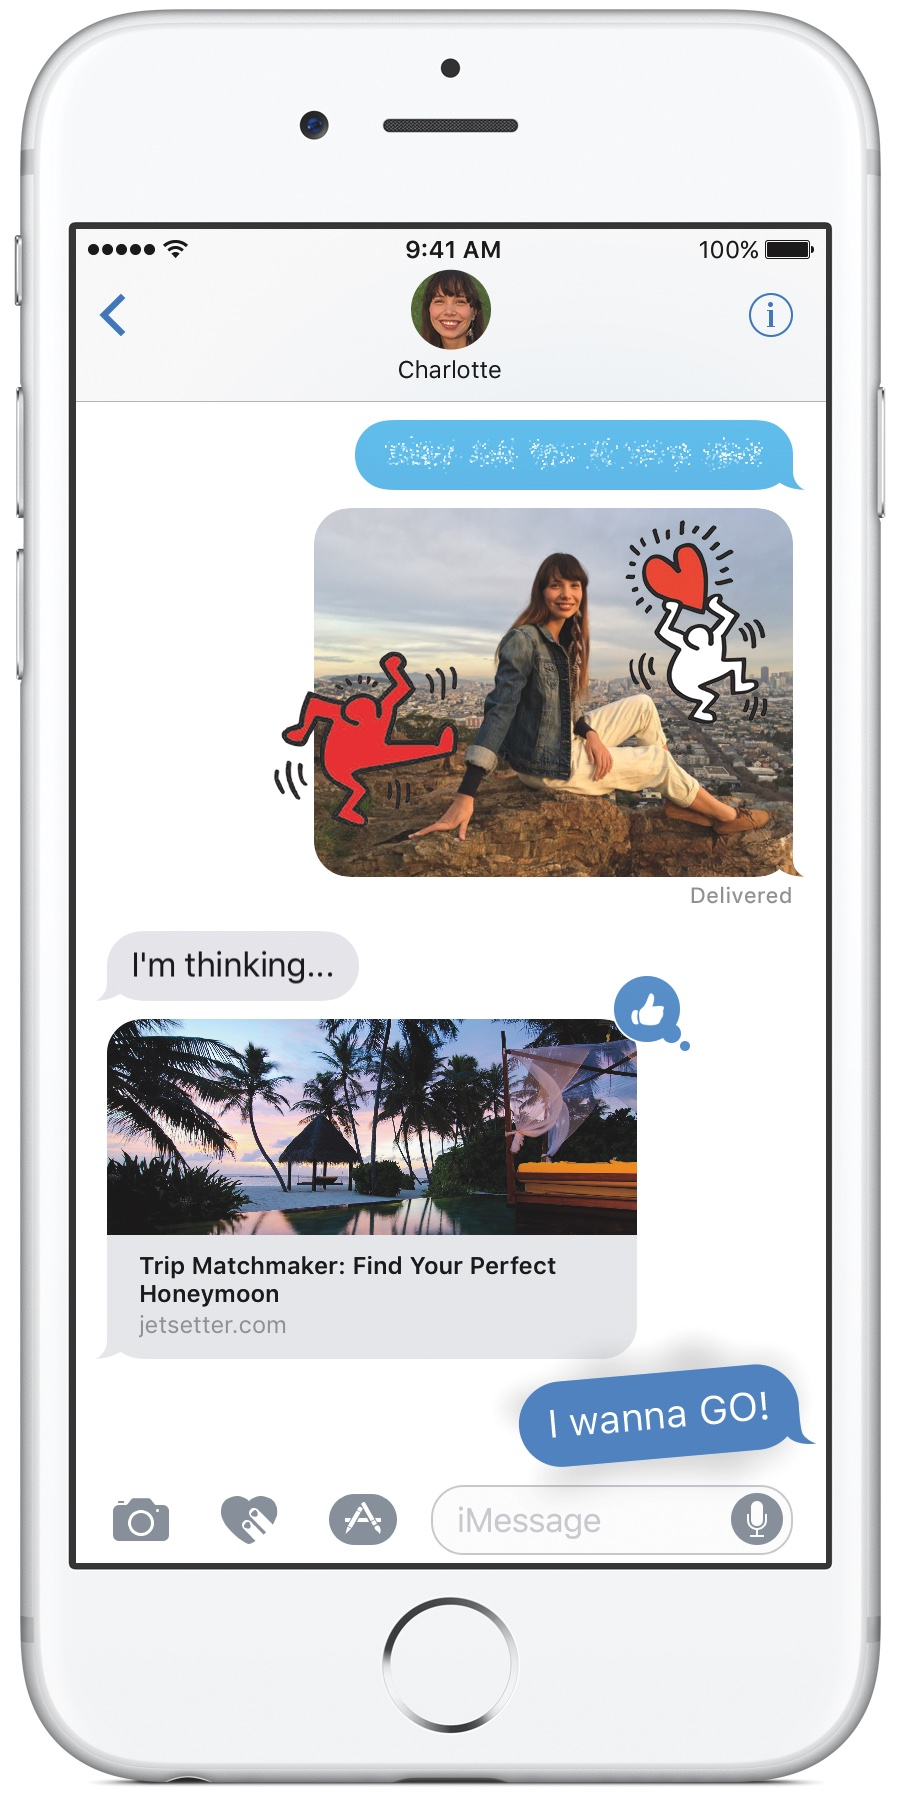 iOS 10 Mensajes chat efectos de burbuja teaser 001